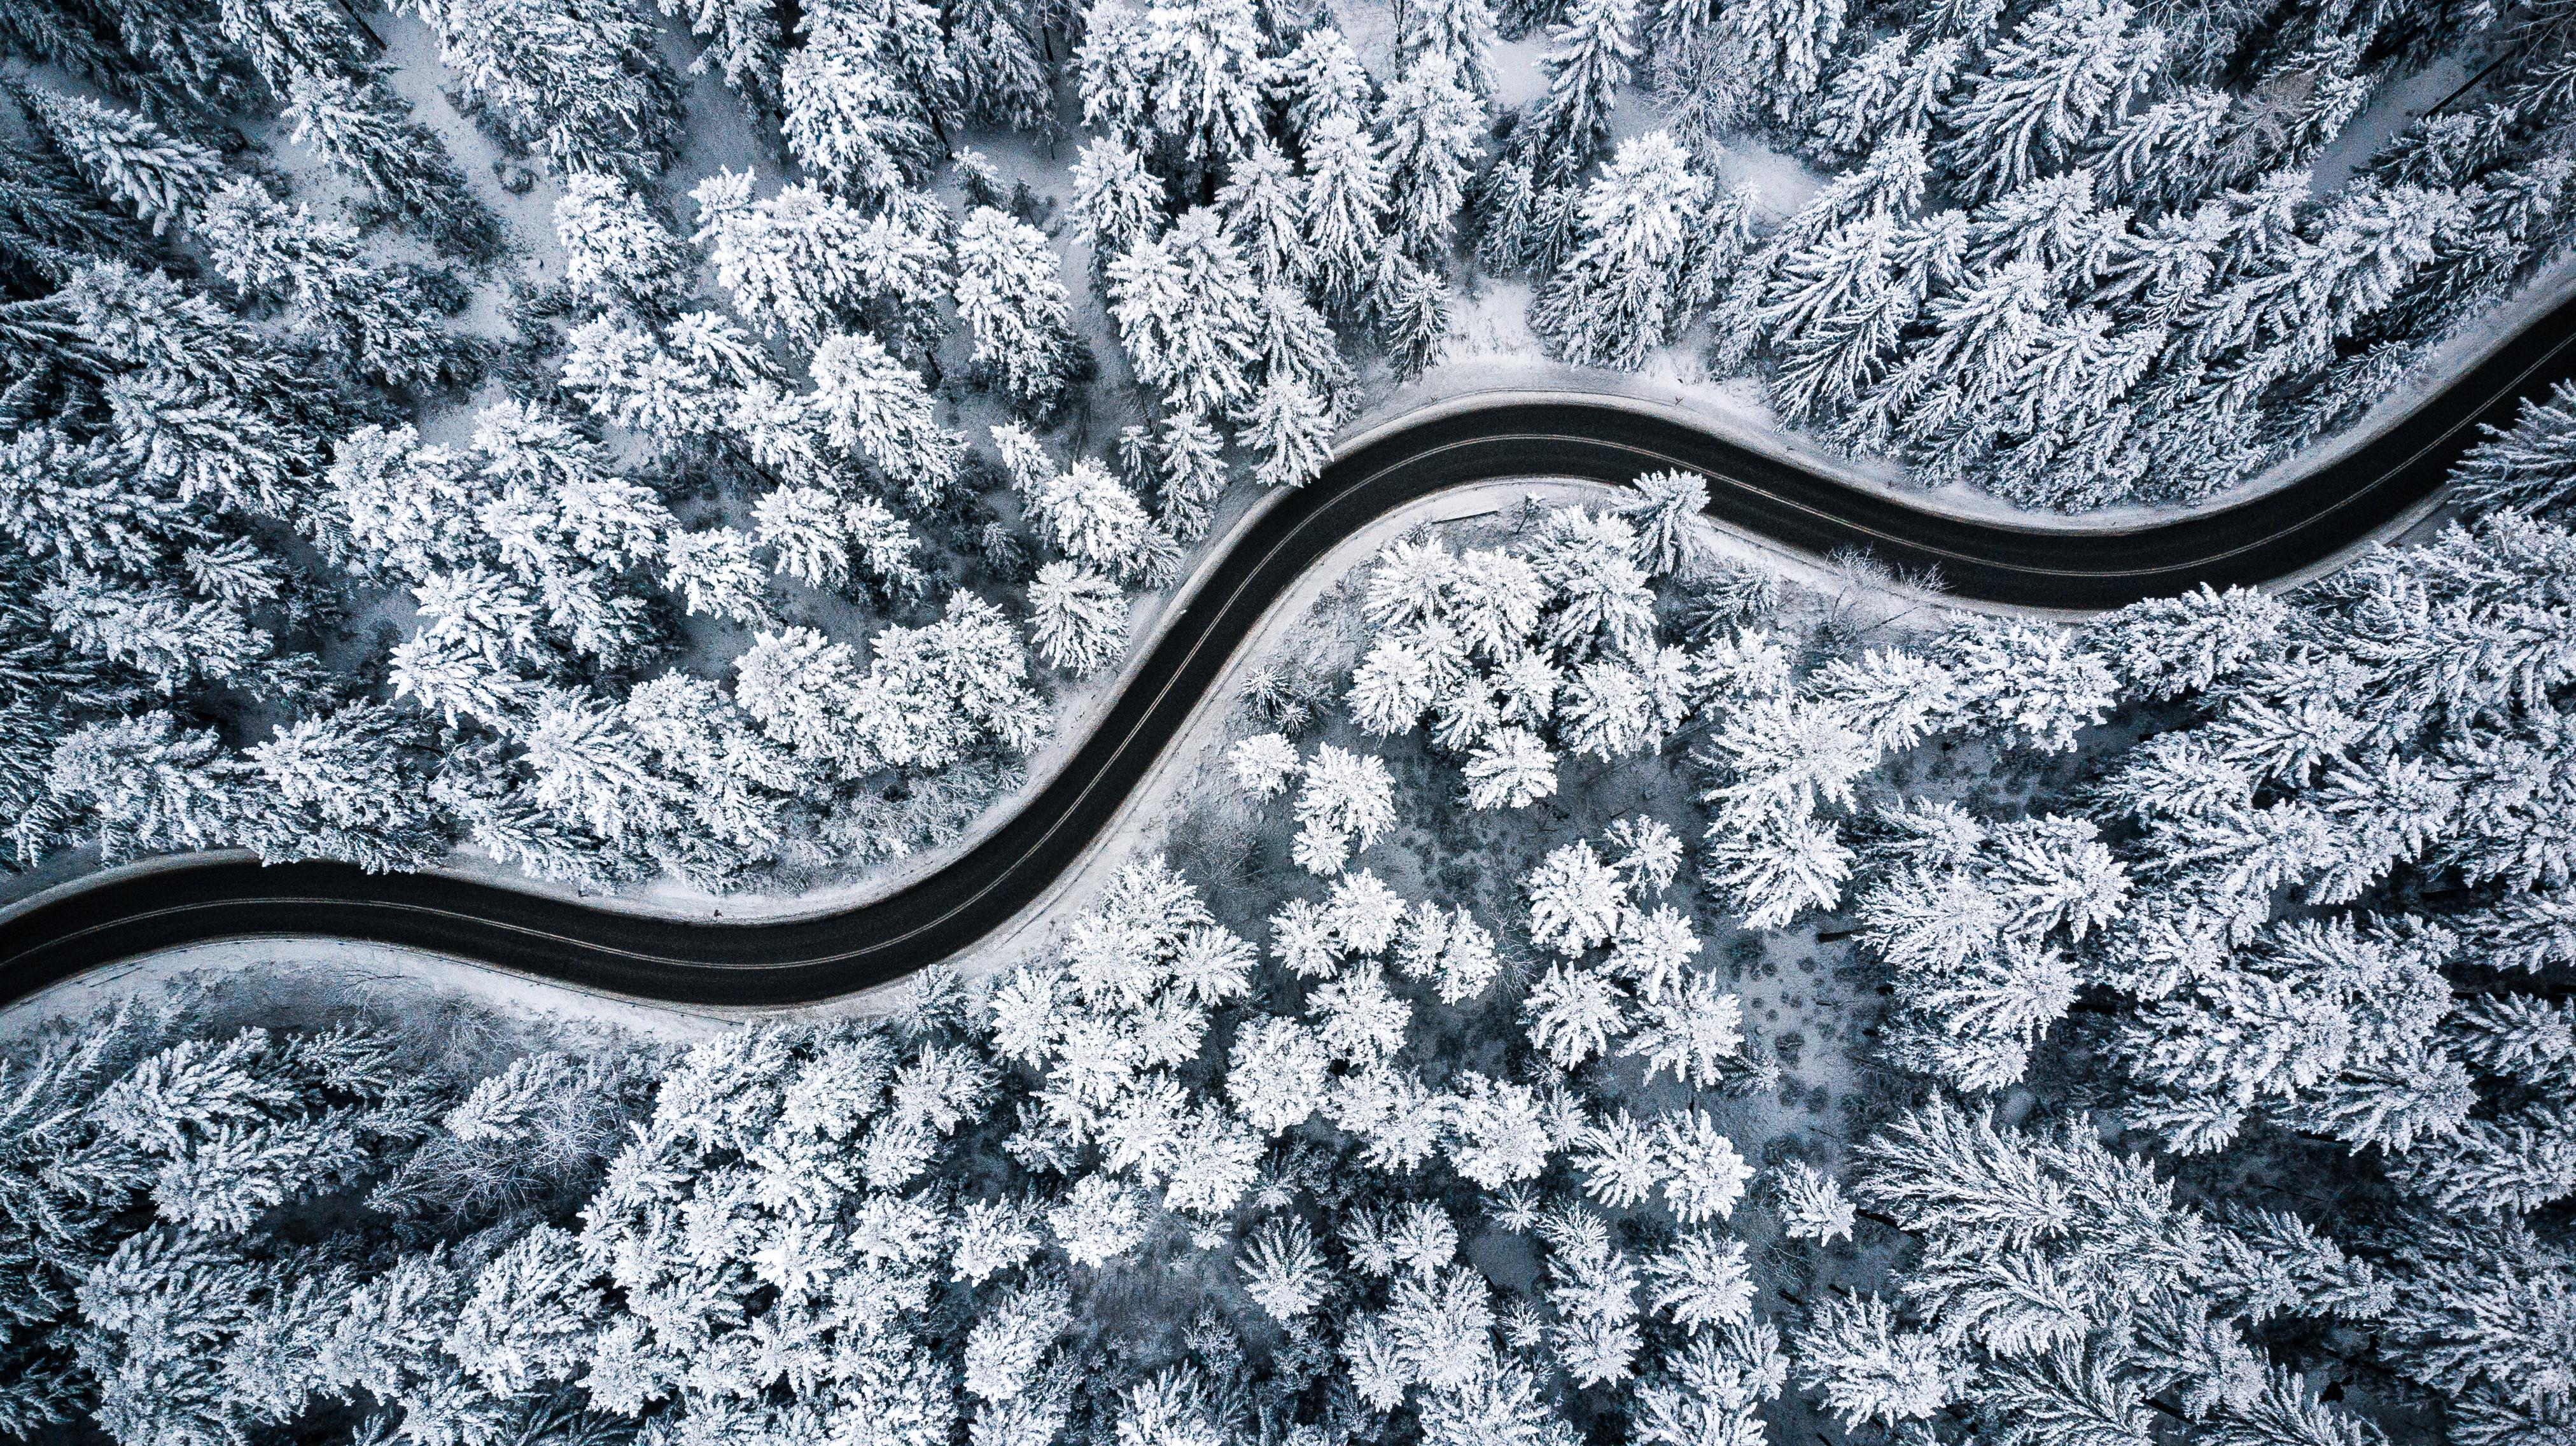 skiurlaub anreise